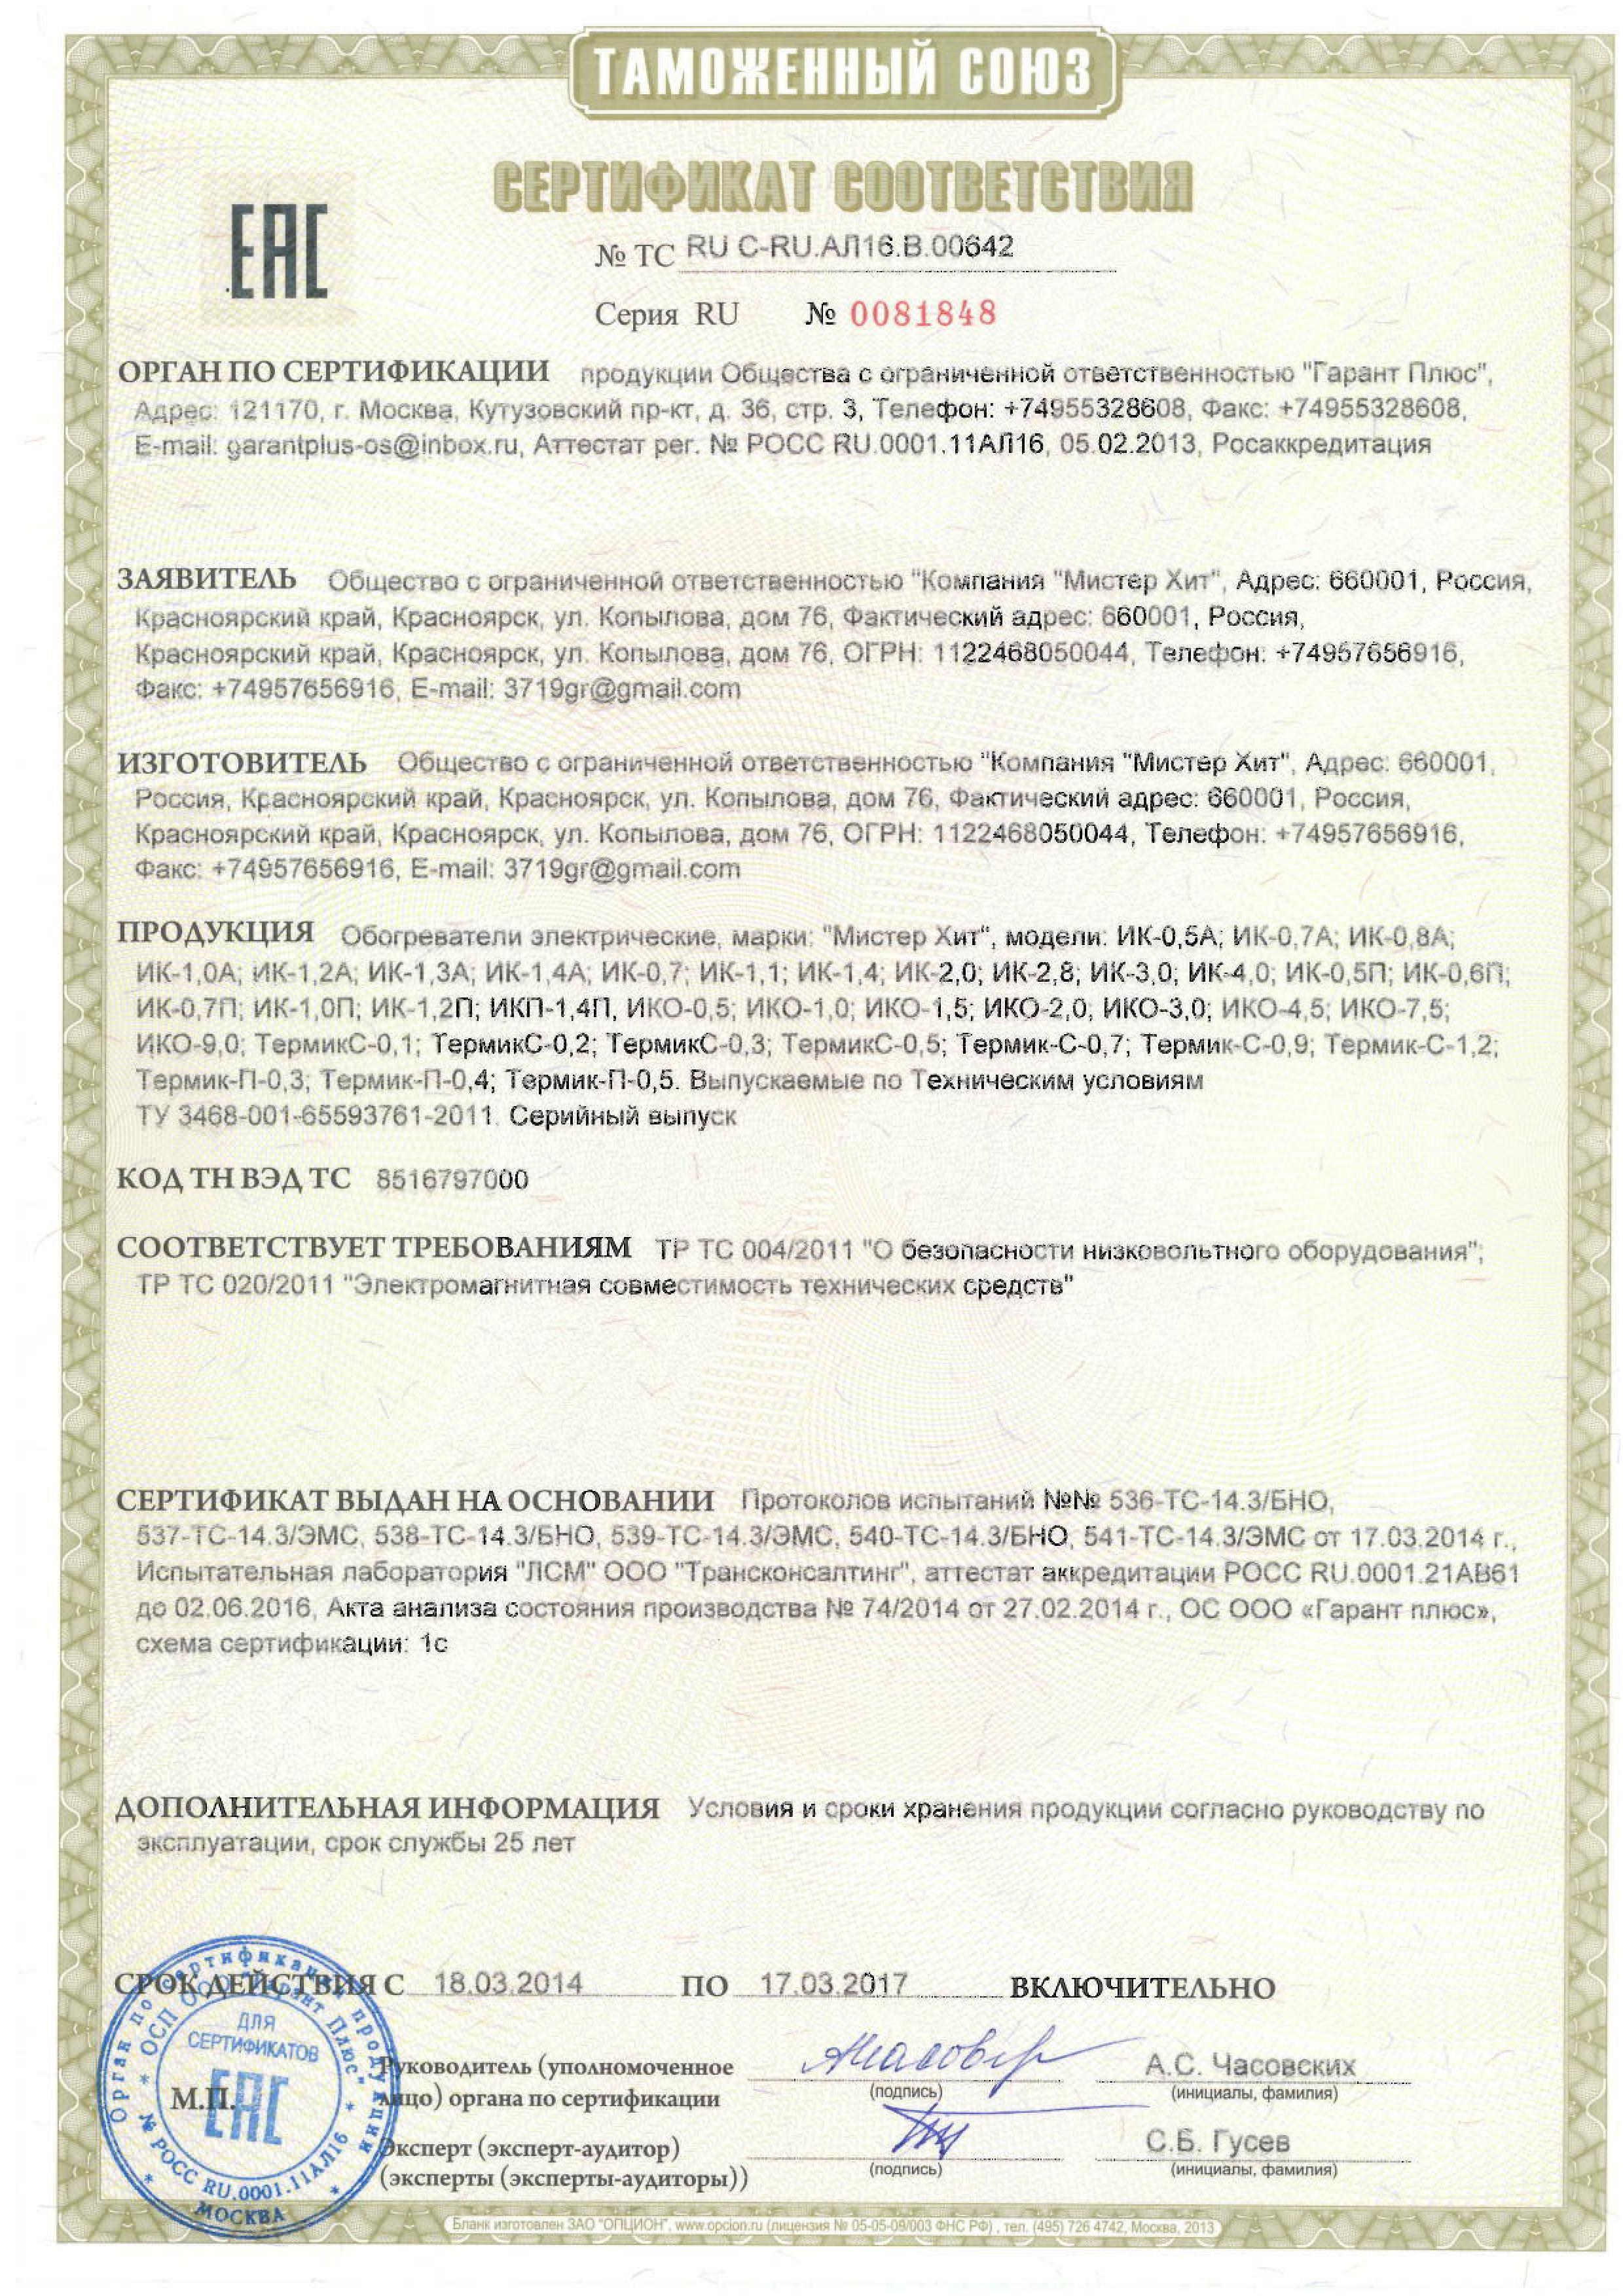 Сертификат соответствия на Мистер-Хит